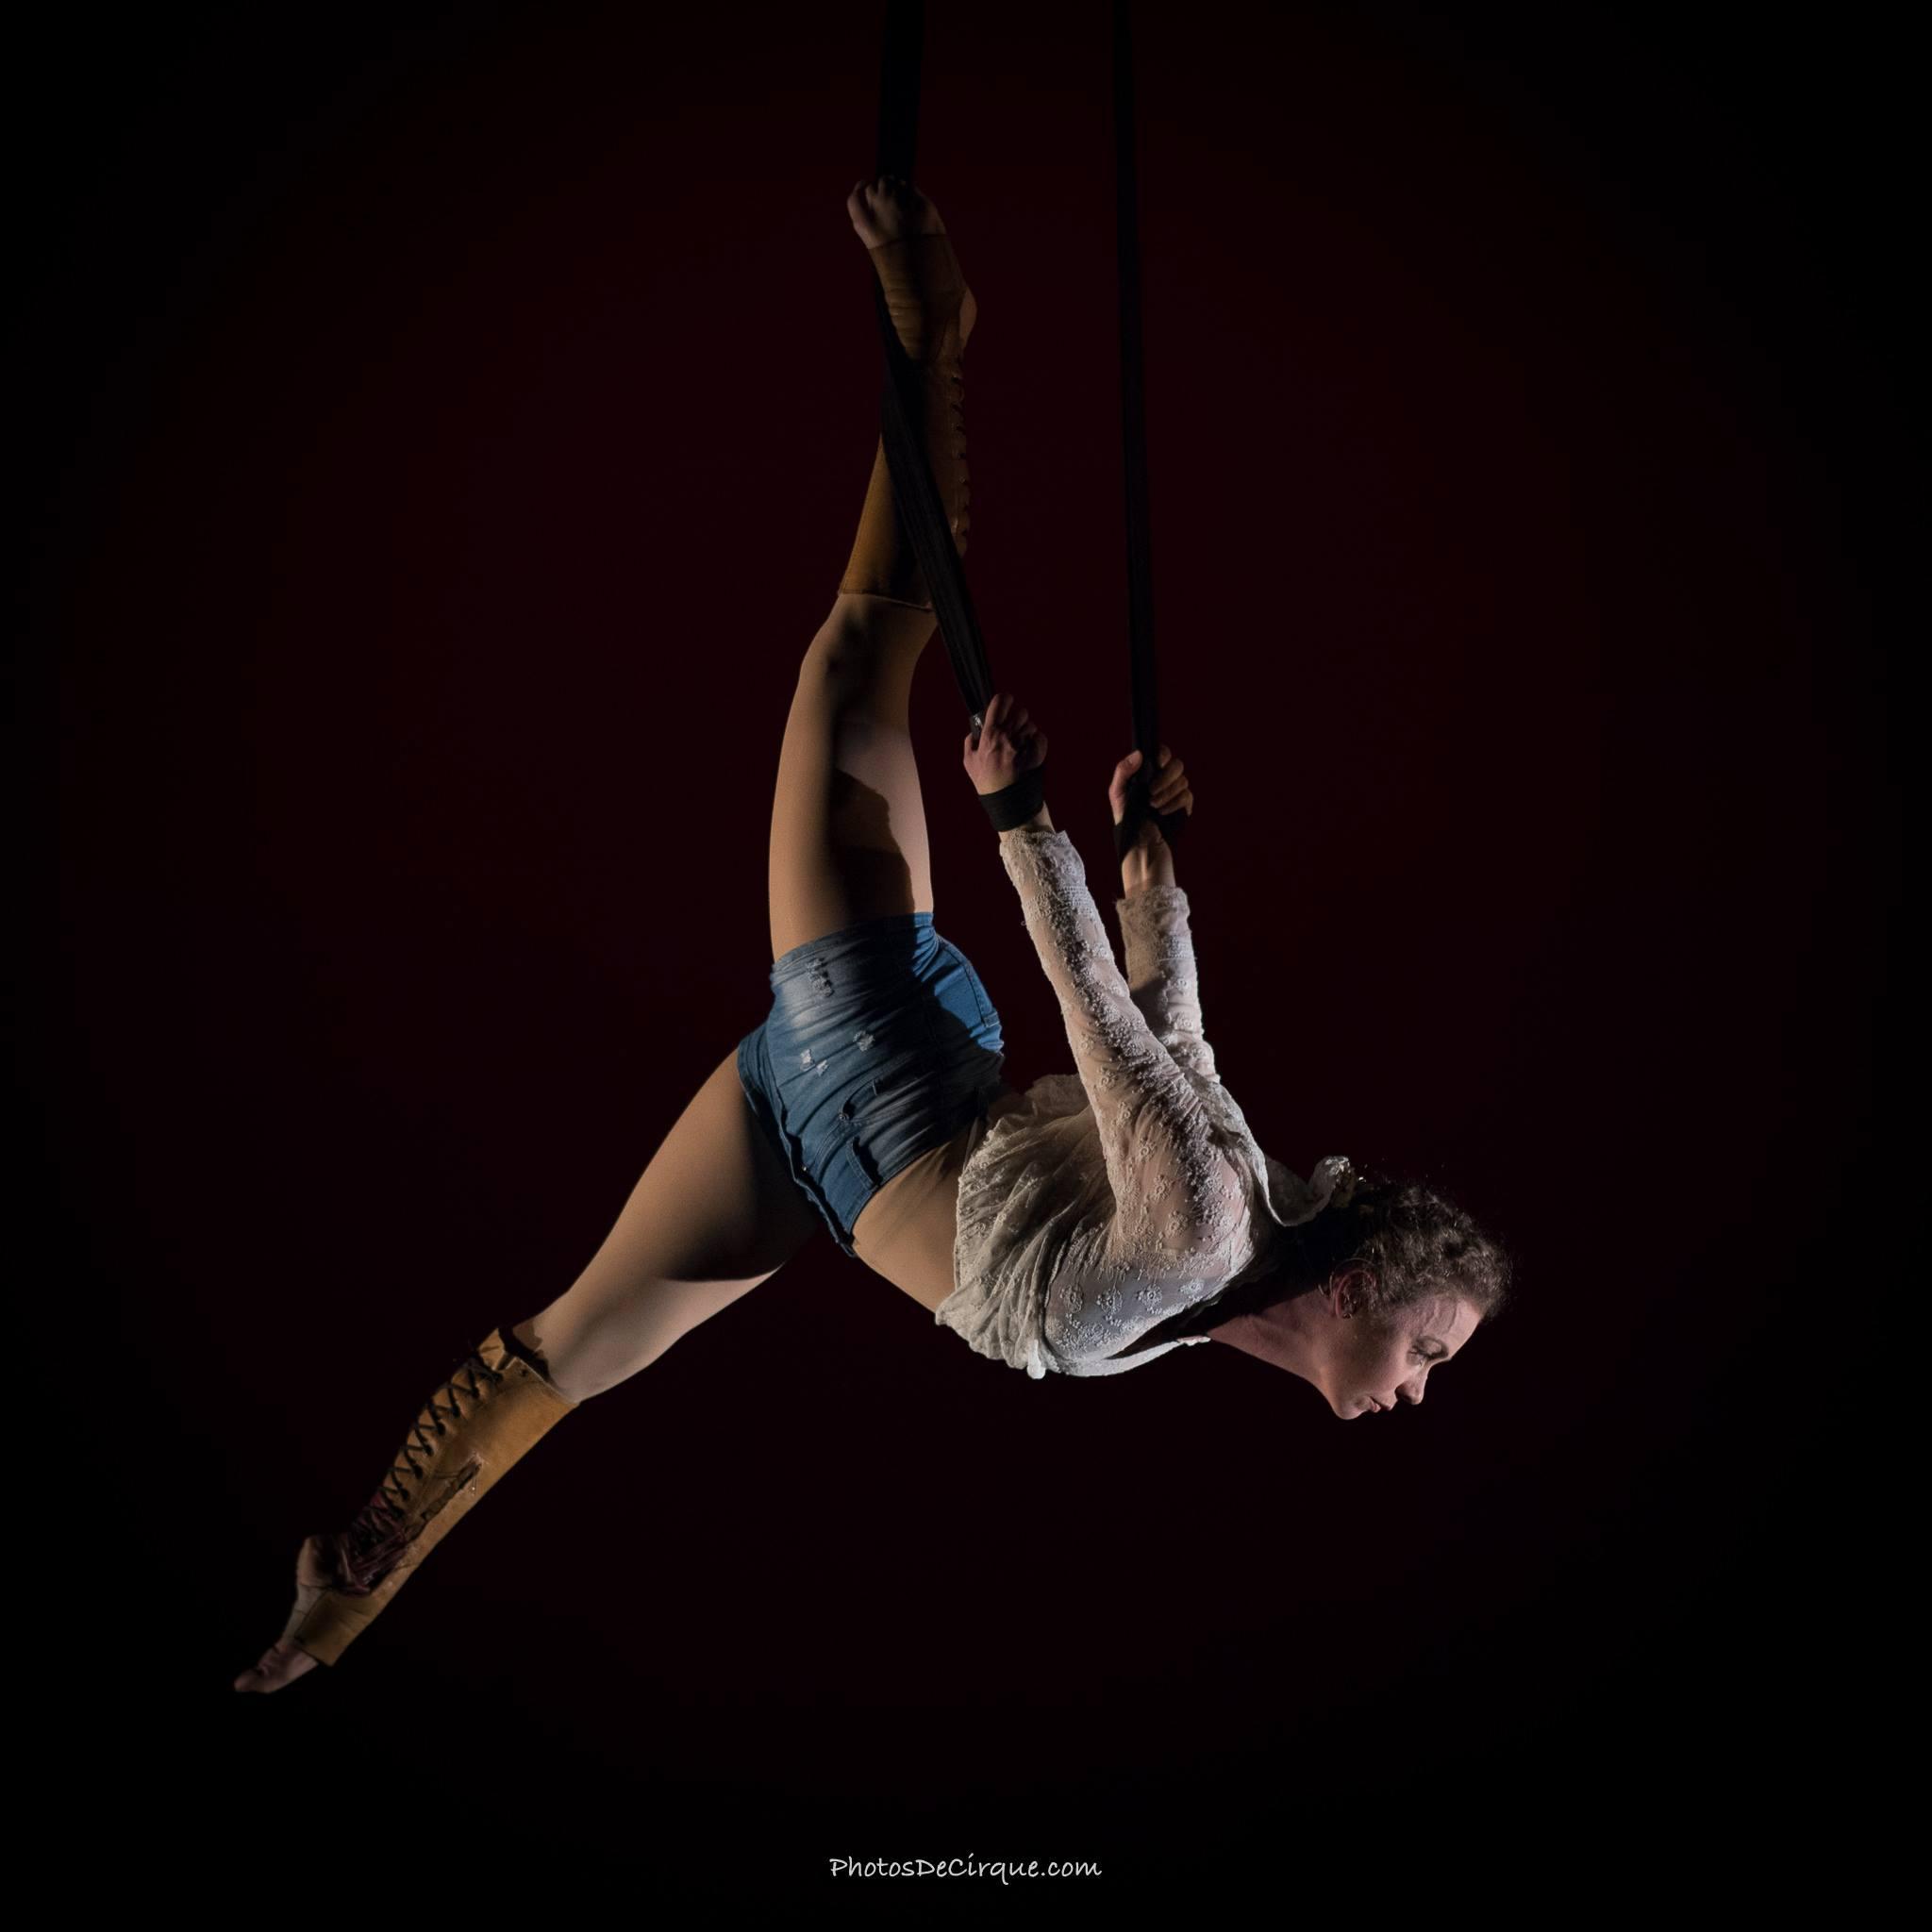 PersephoneBound_5_Leda Davies_PhotoCredit_Jim Mneymneh_aerial_straps_circus_theatre